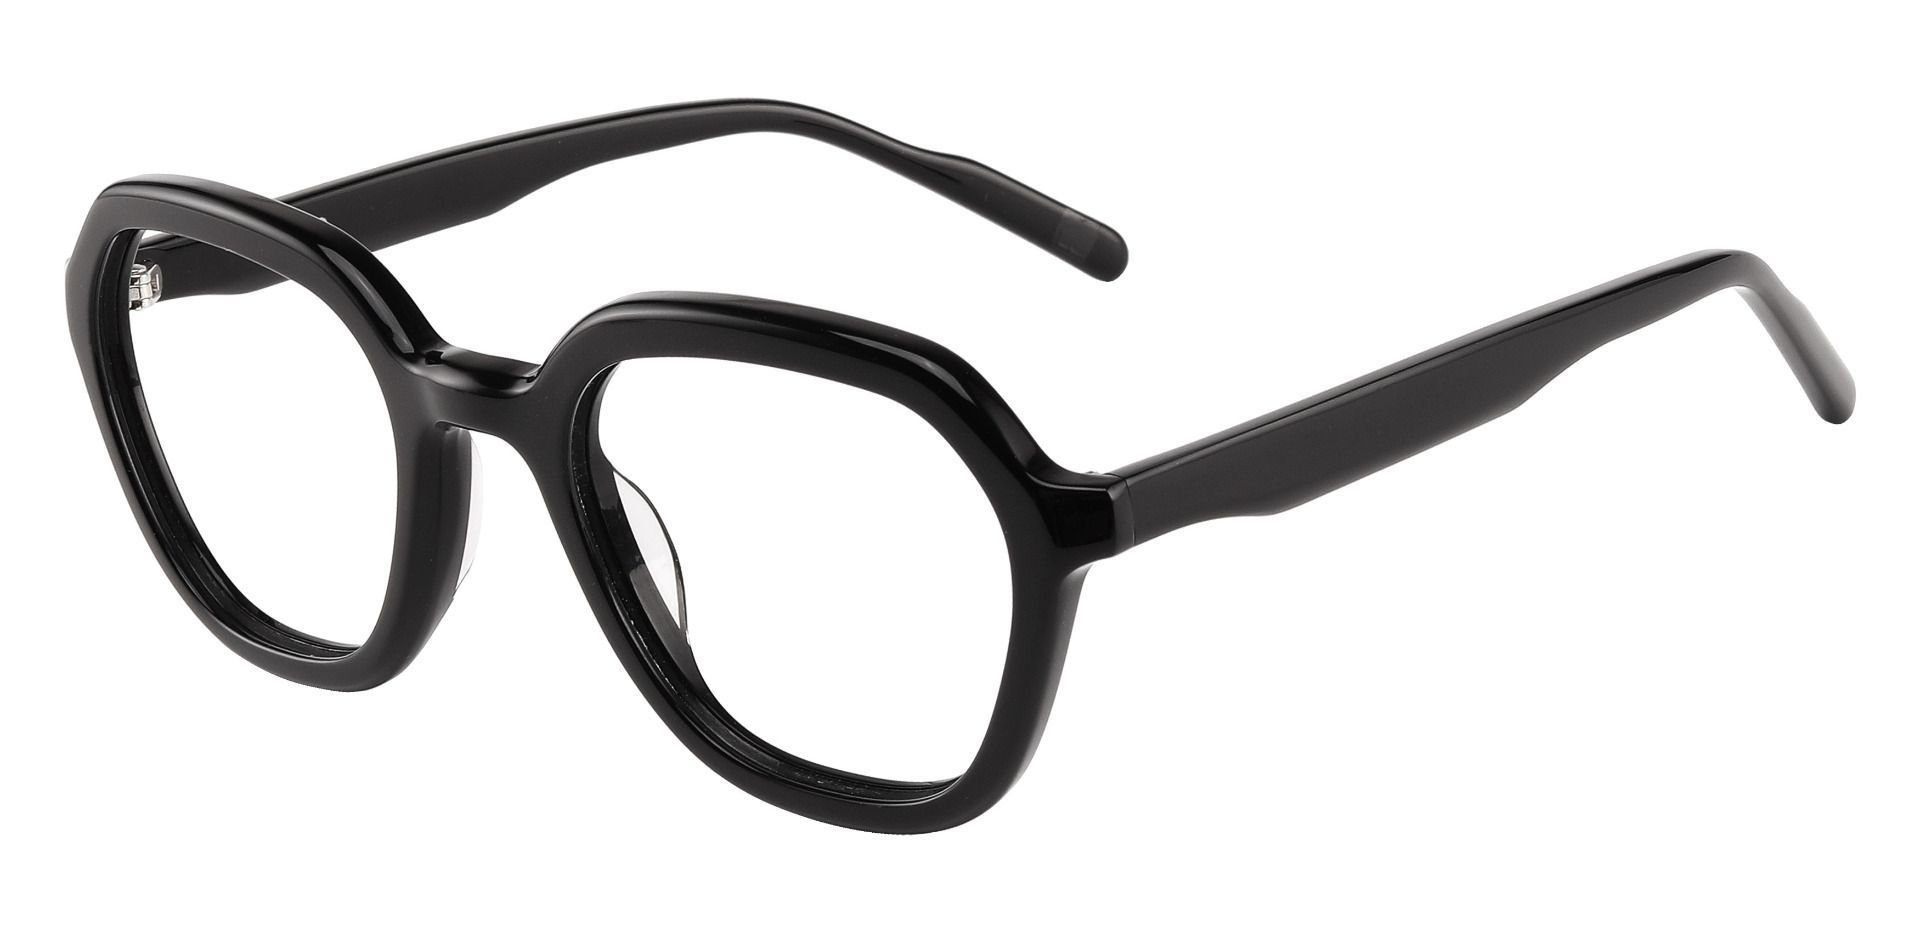 Mandarin Geometric Prescription Glasses - Black